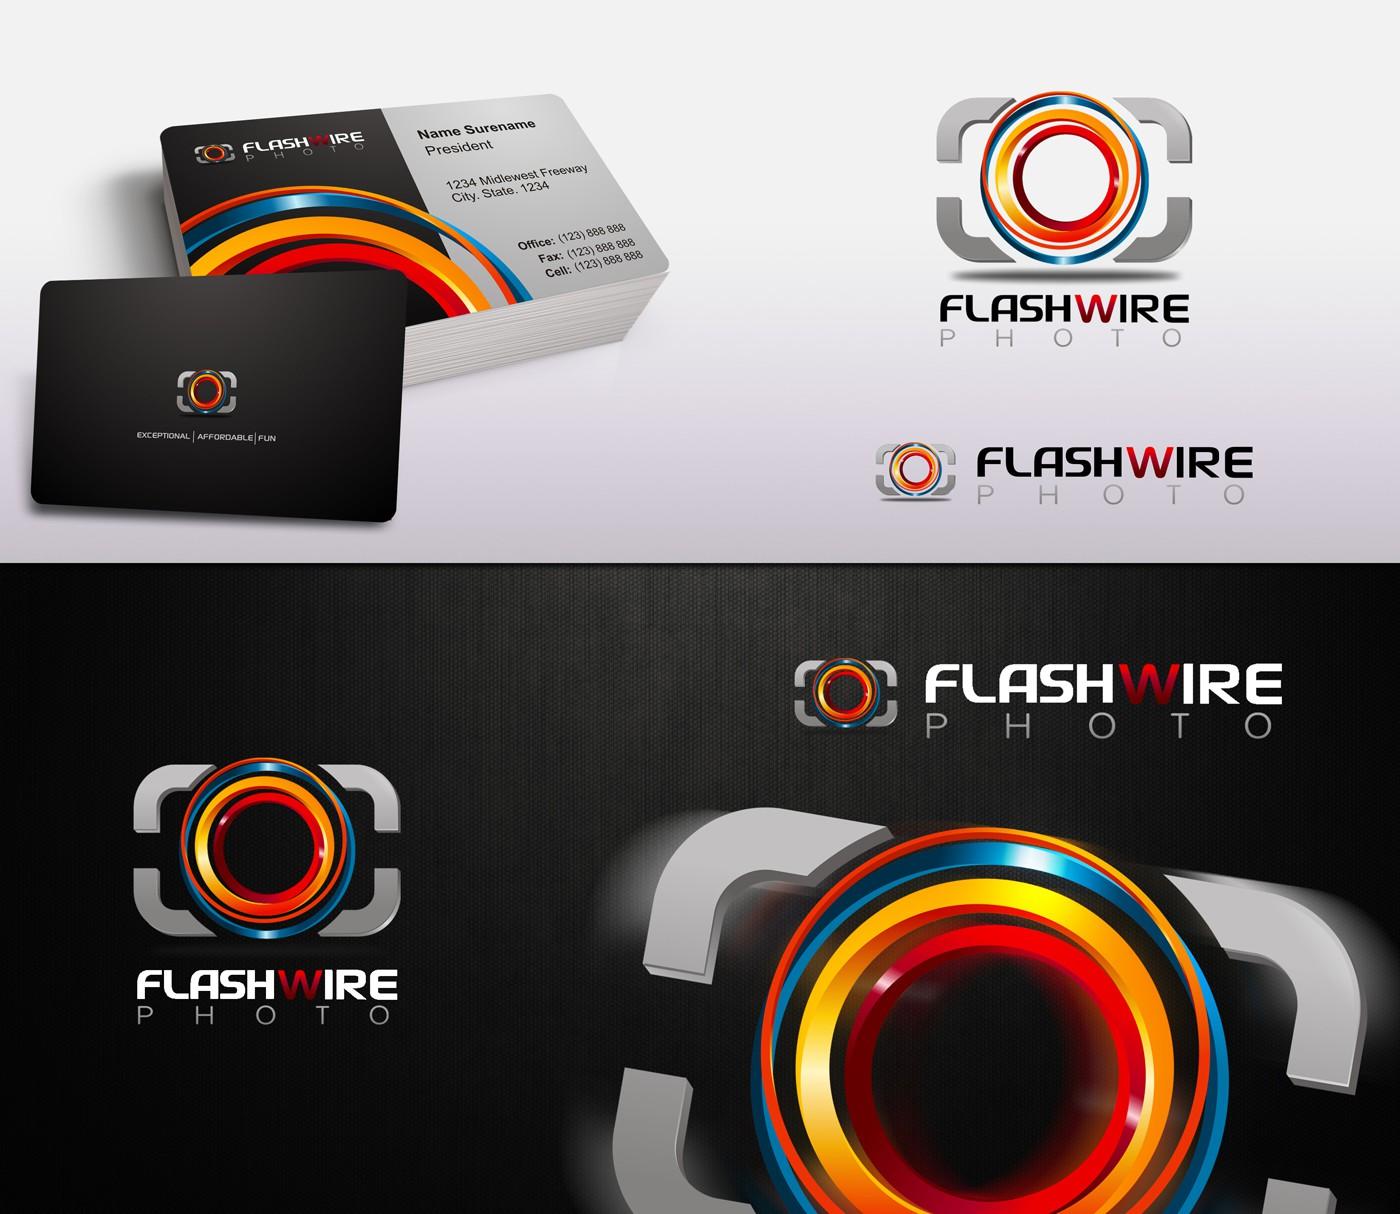 FAMOUS BUSINESS LOGO: Flashwire Photo